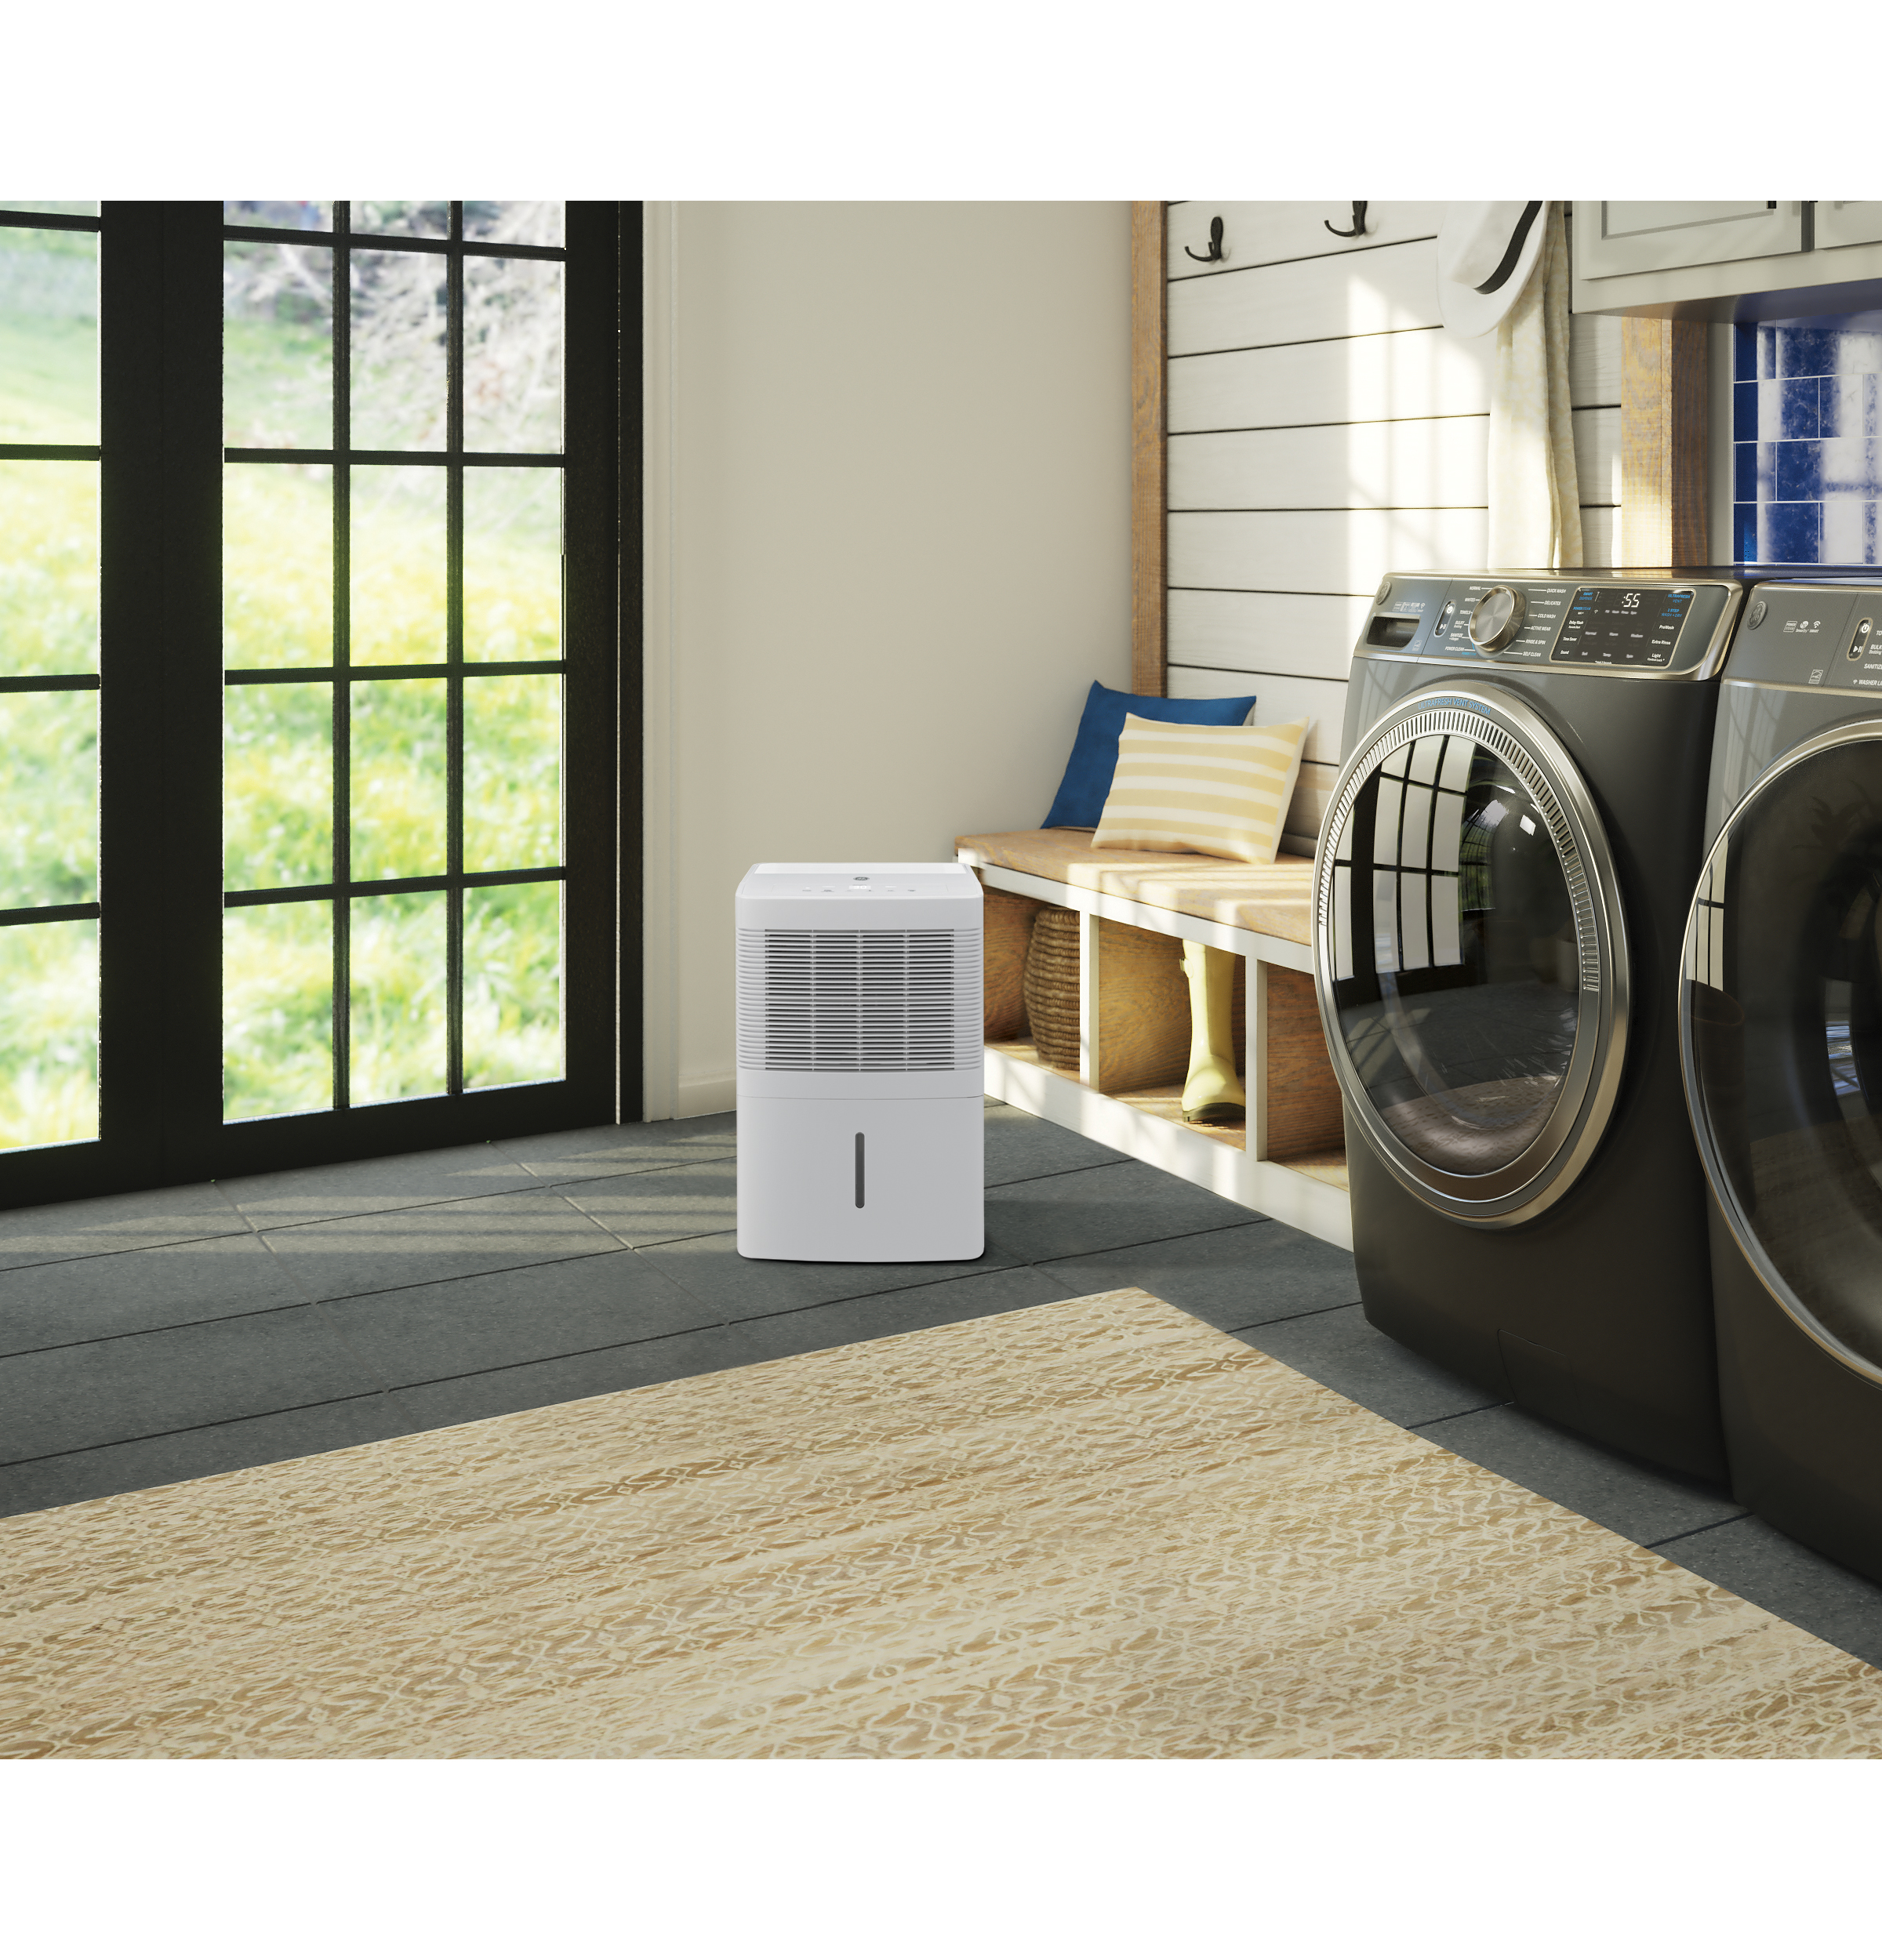 Model: ADEL20LY | GE GE® Dehumidifier